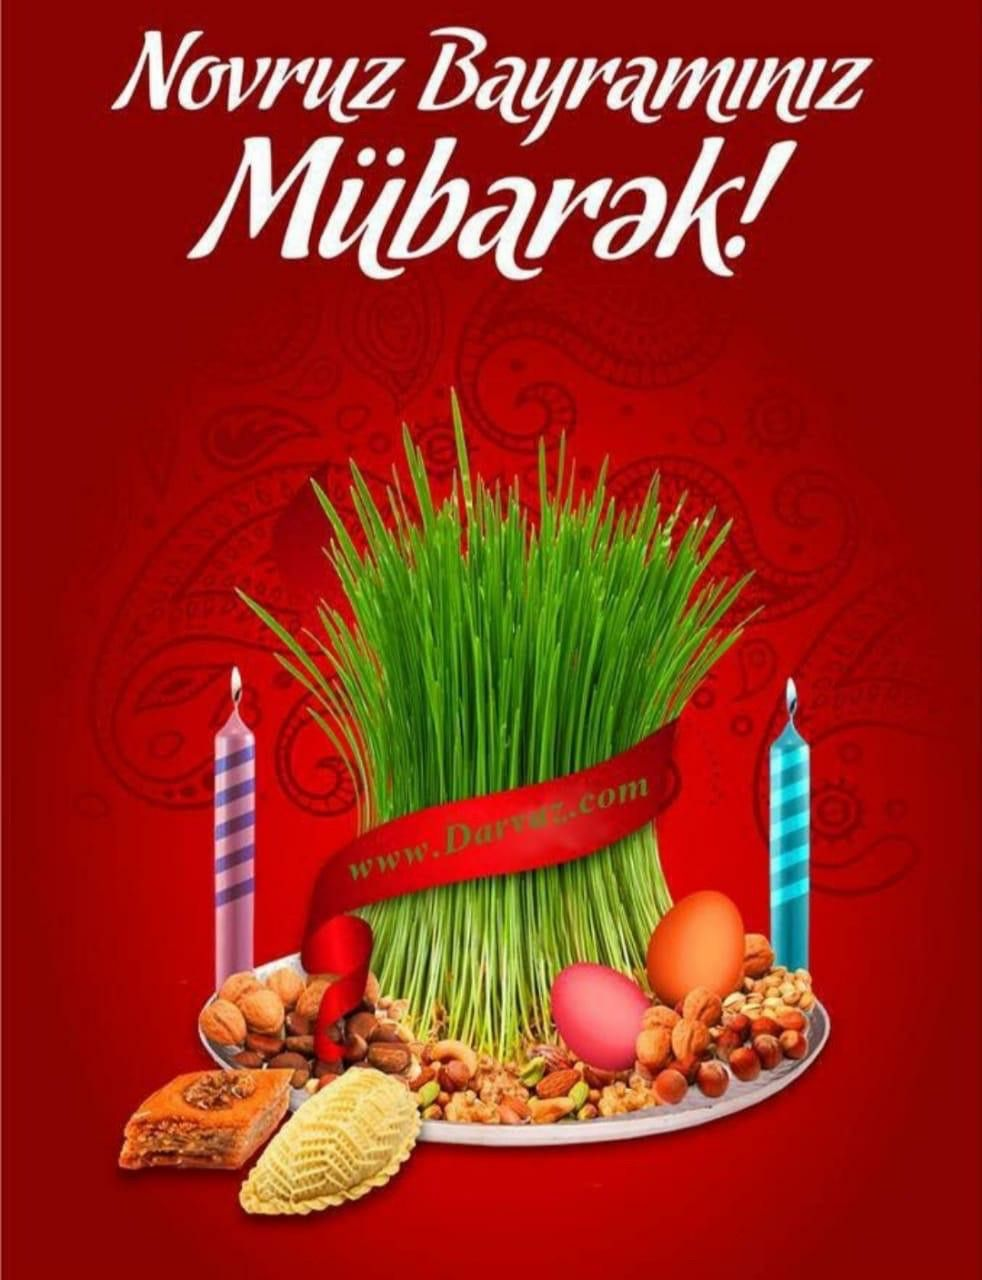 Novruz Bayrami Təbriki Aciqca Alphabet Wallpaper Birthday Cake Birthday